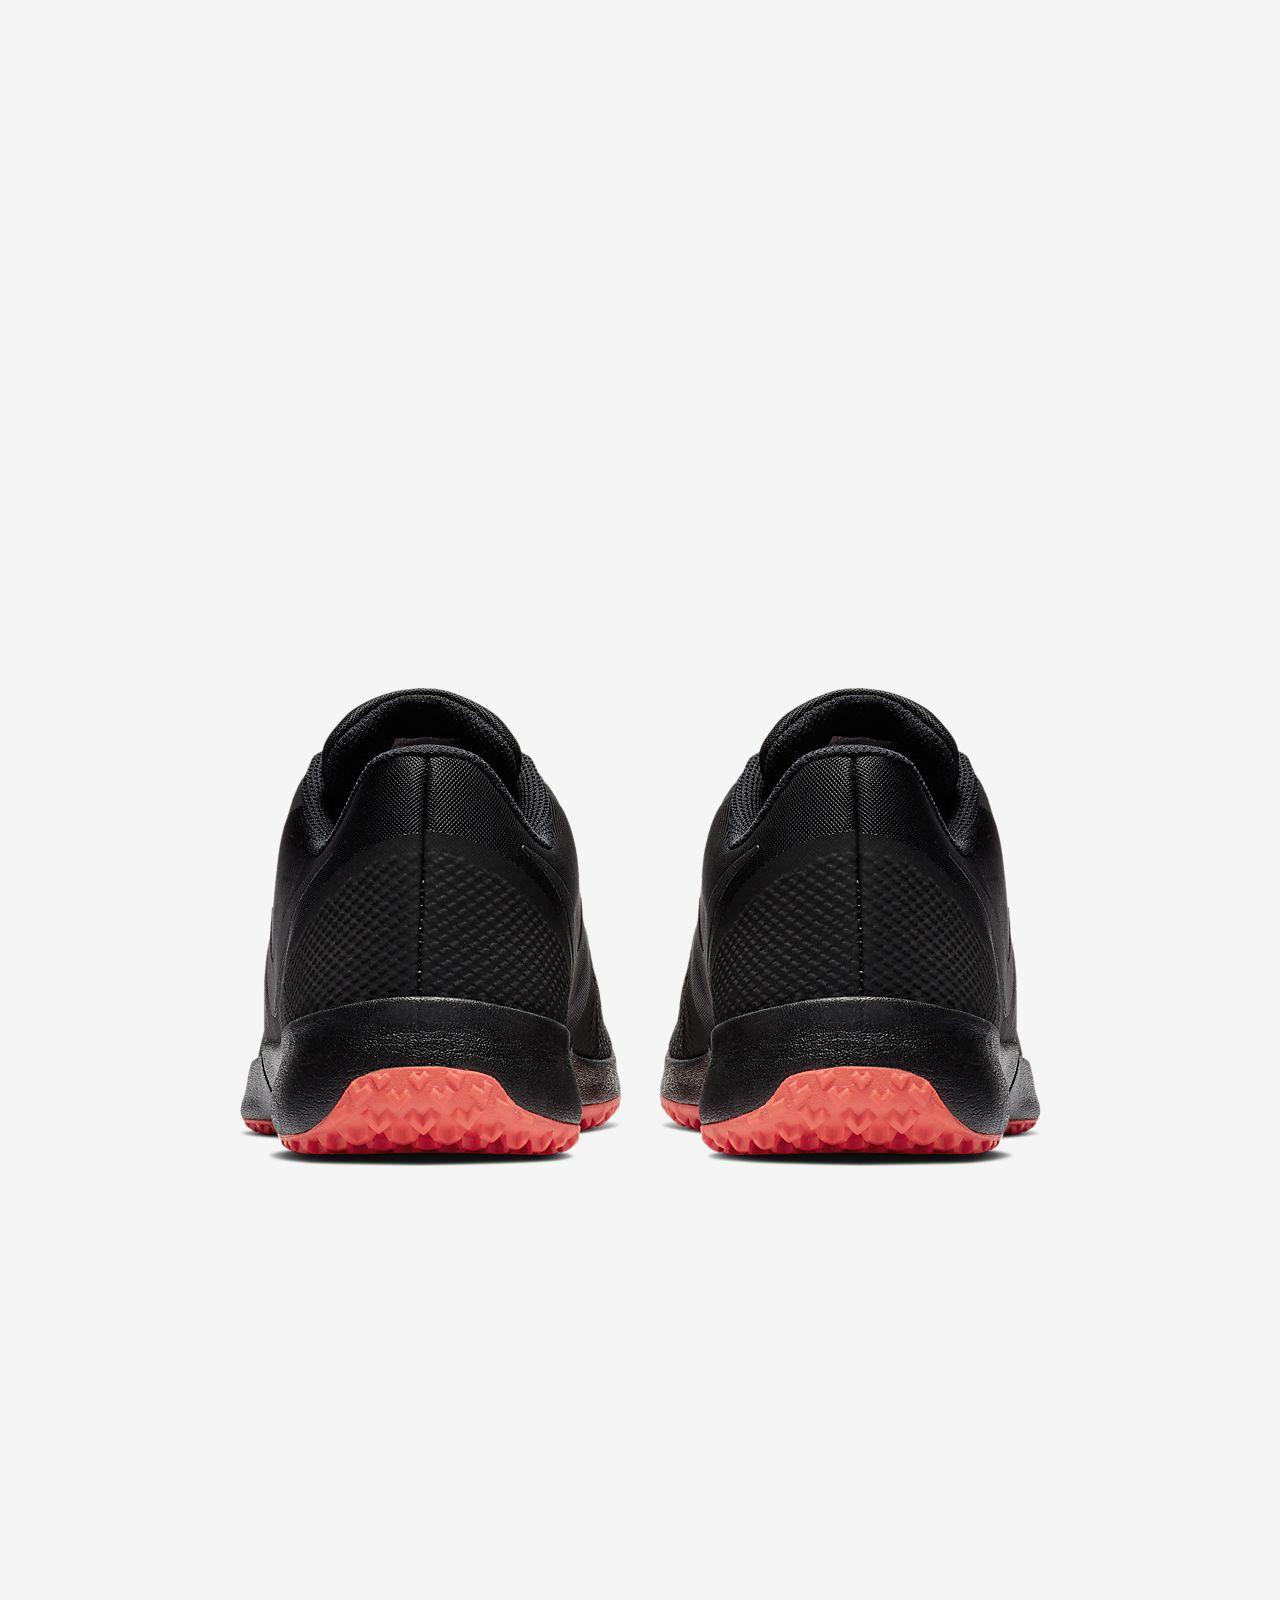 new arrival 2c9c6 ffd3b ... Nike Varsity Compete Trainer Men s Gym Sport Training Shoe